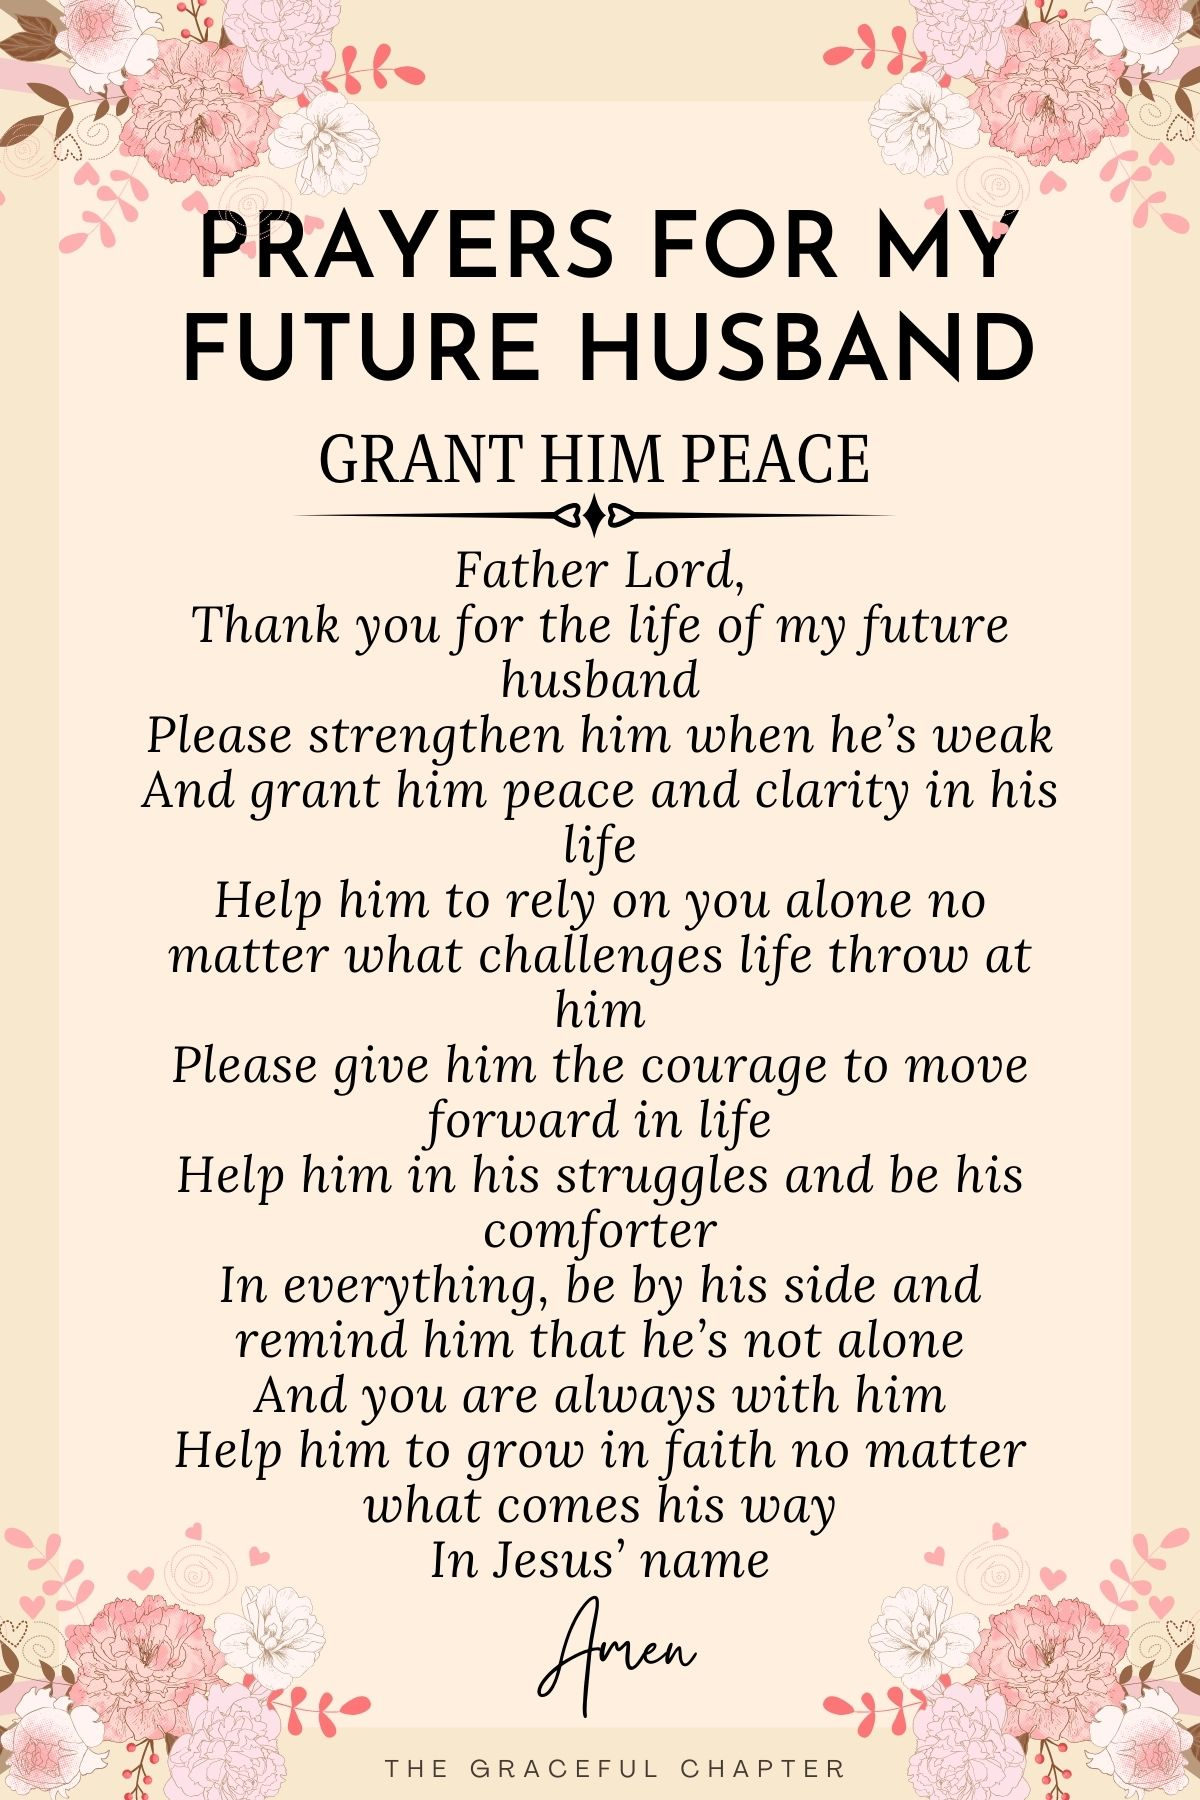 Prayer for my future husband- Grant him peace